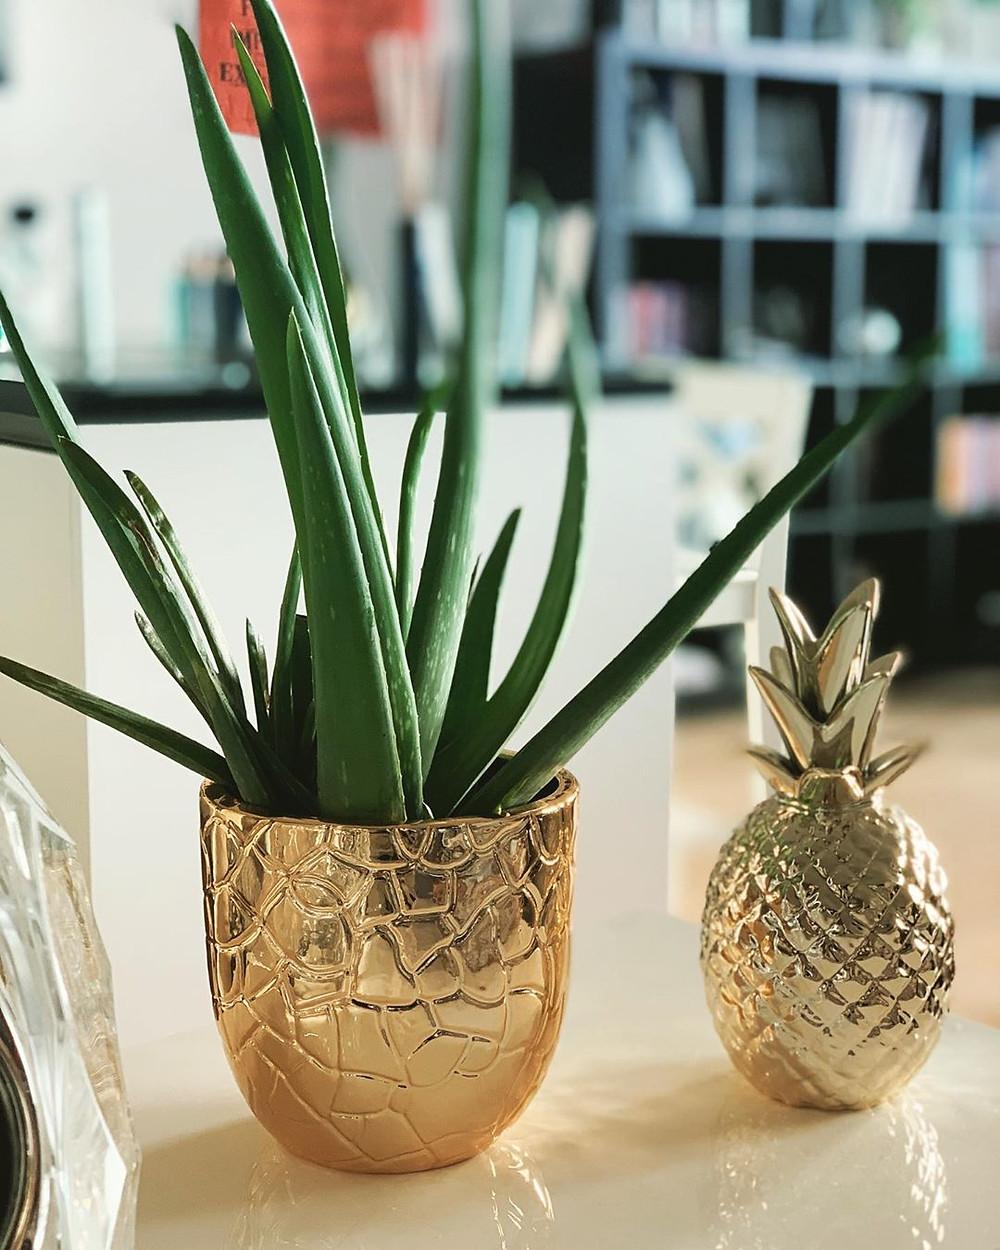 Aloe Vera Quick Fast Growing Houseplants